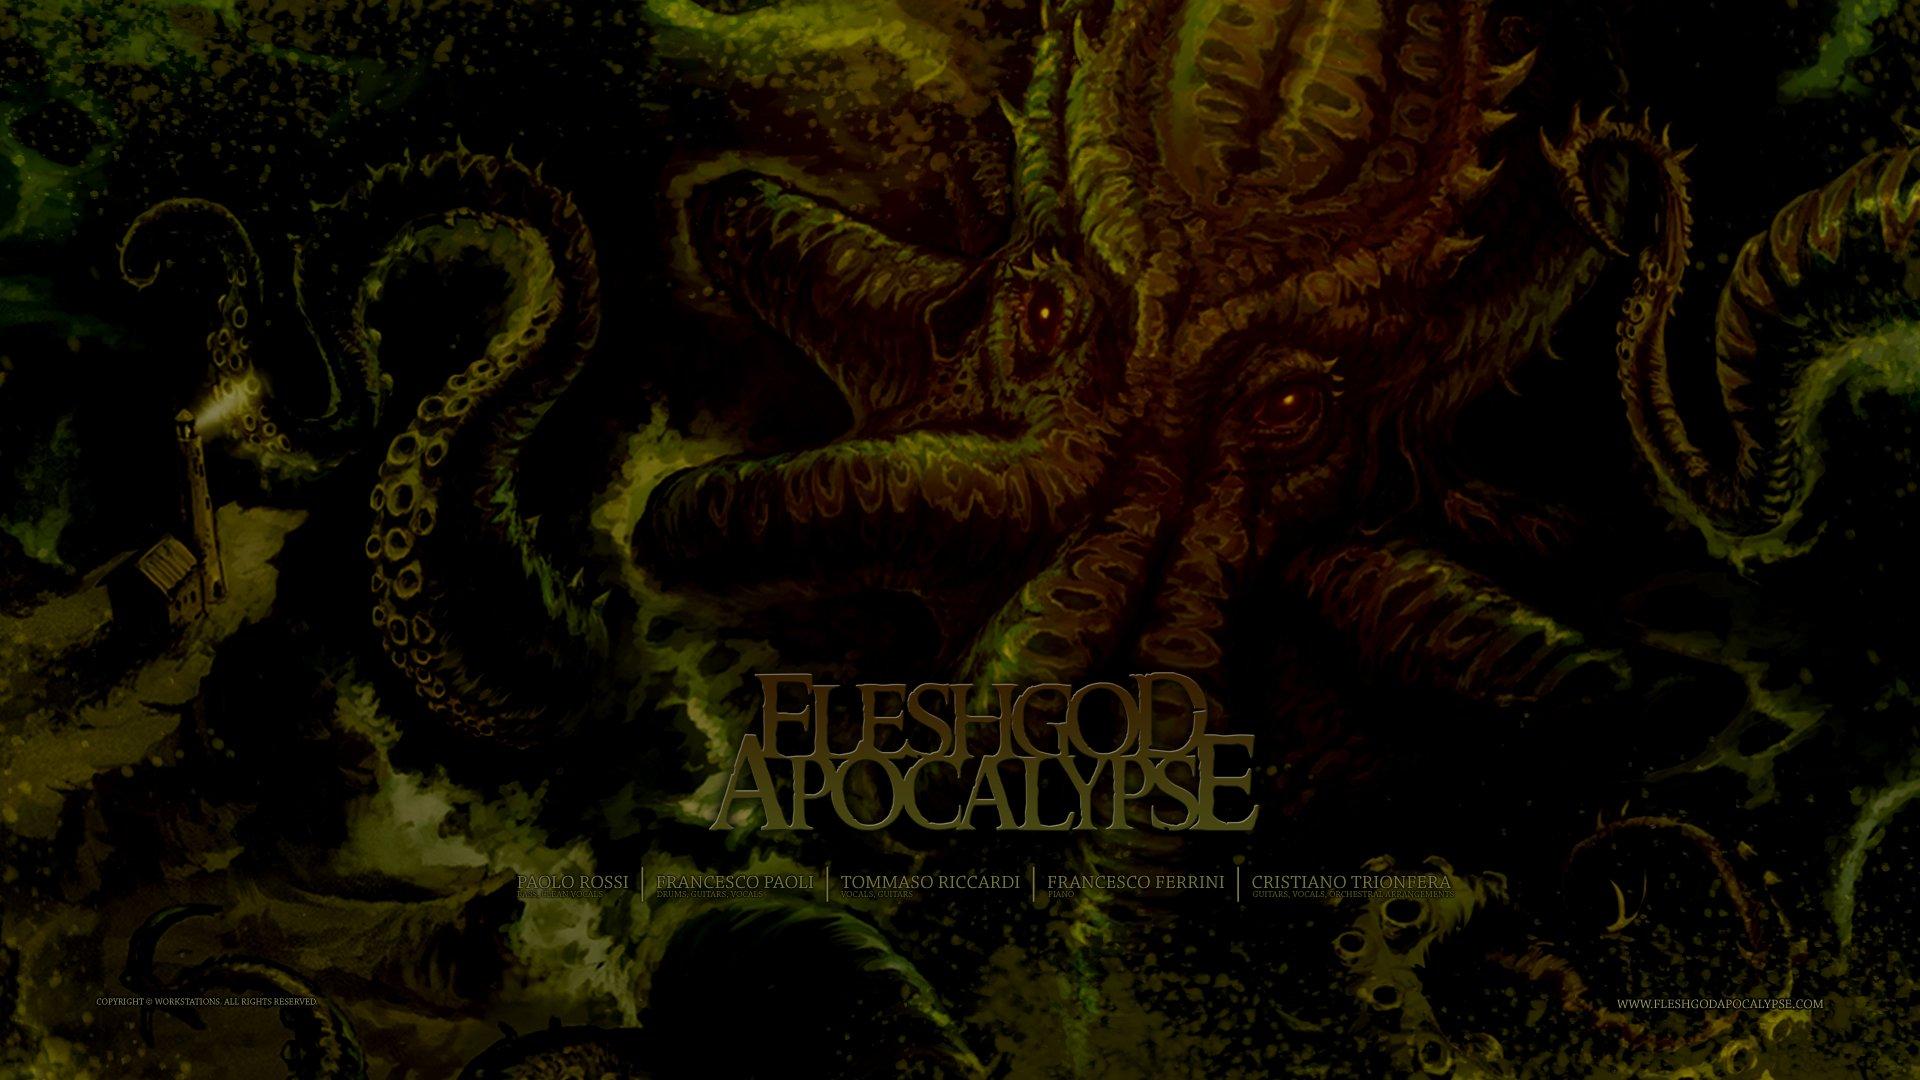 1 Fleshgod Apocalypse Fondos De Pantalla Hd Fondos De